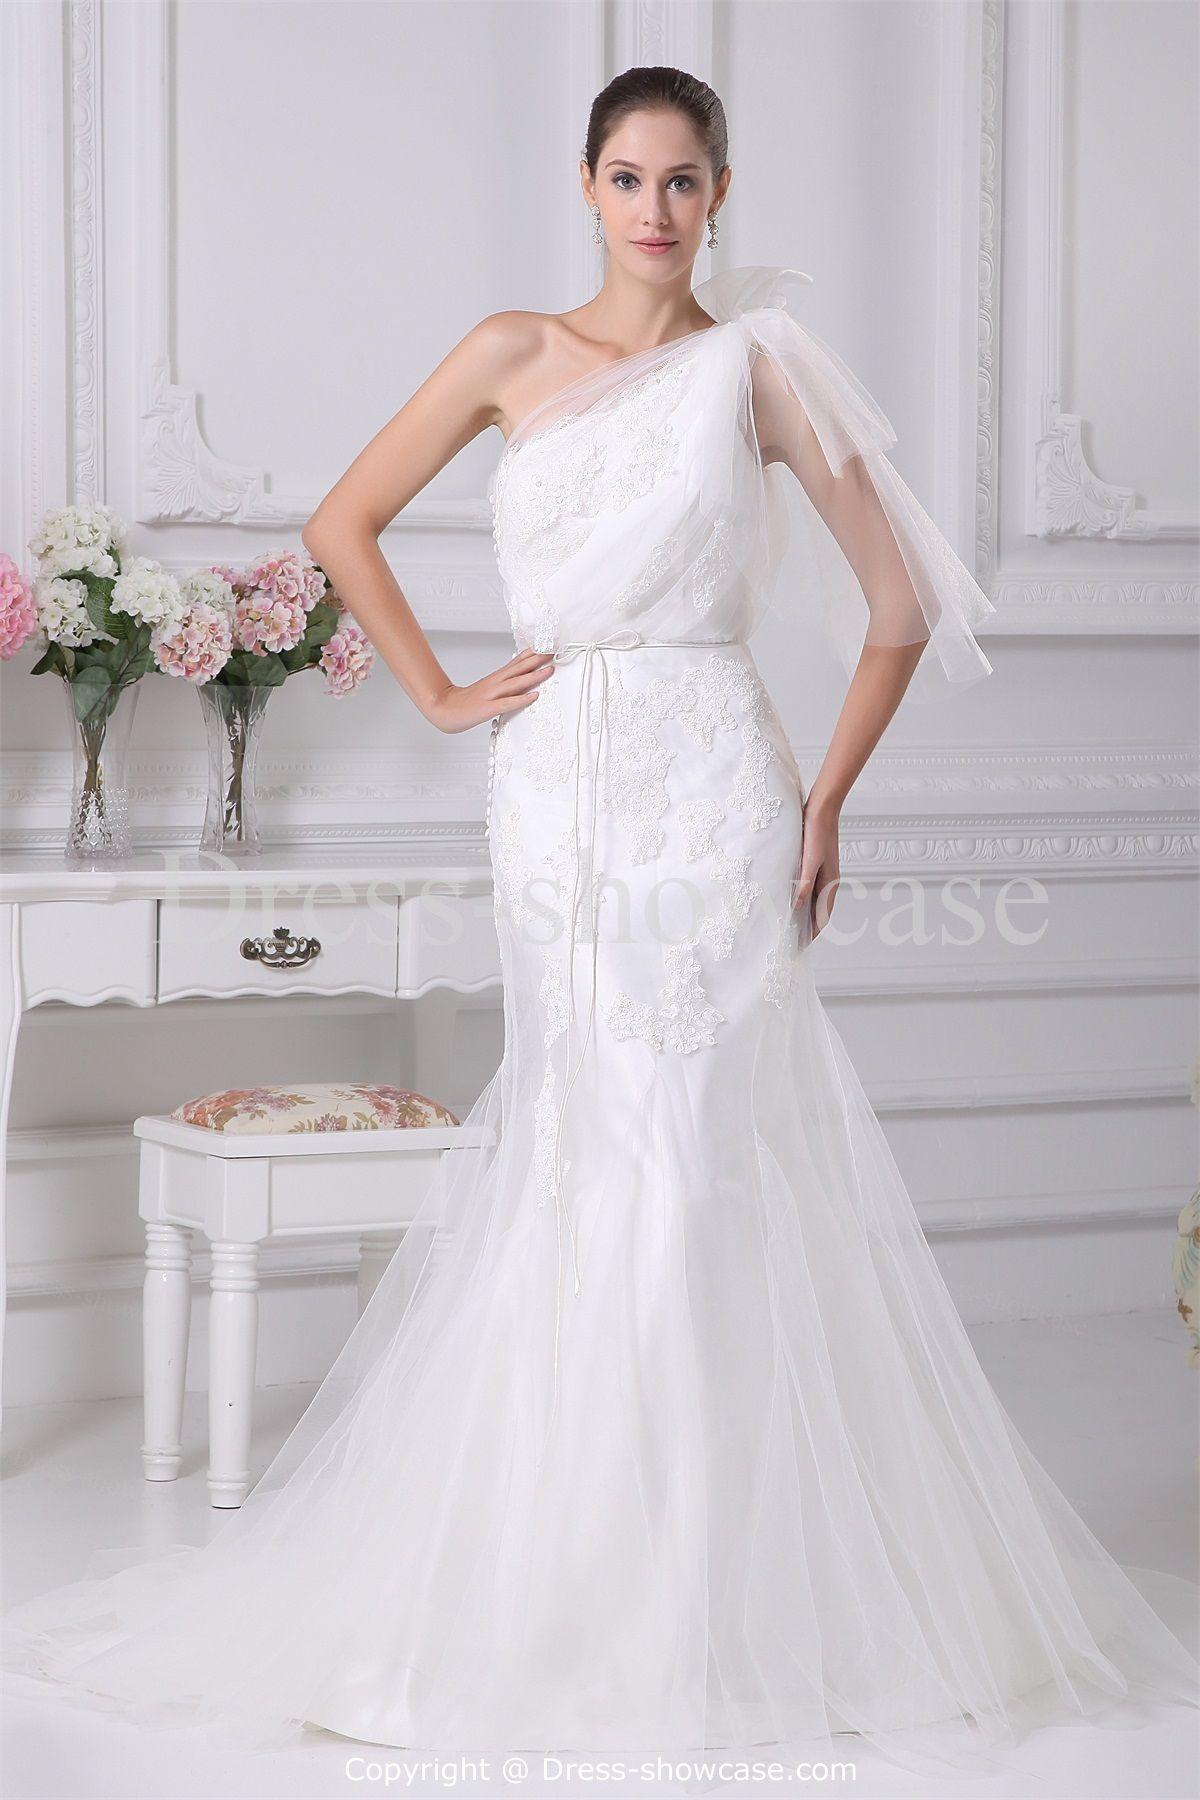 Beading sleeveless aline garden wedding dress wholesale price us